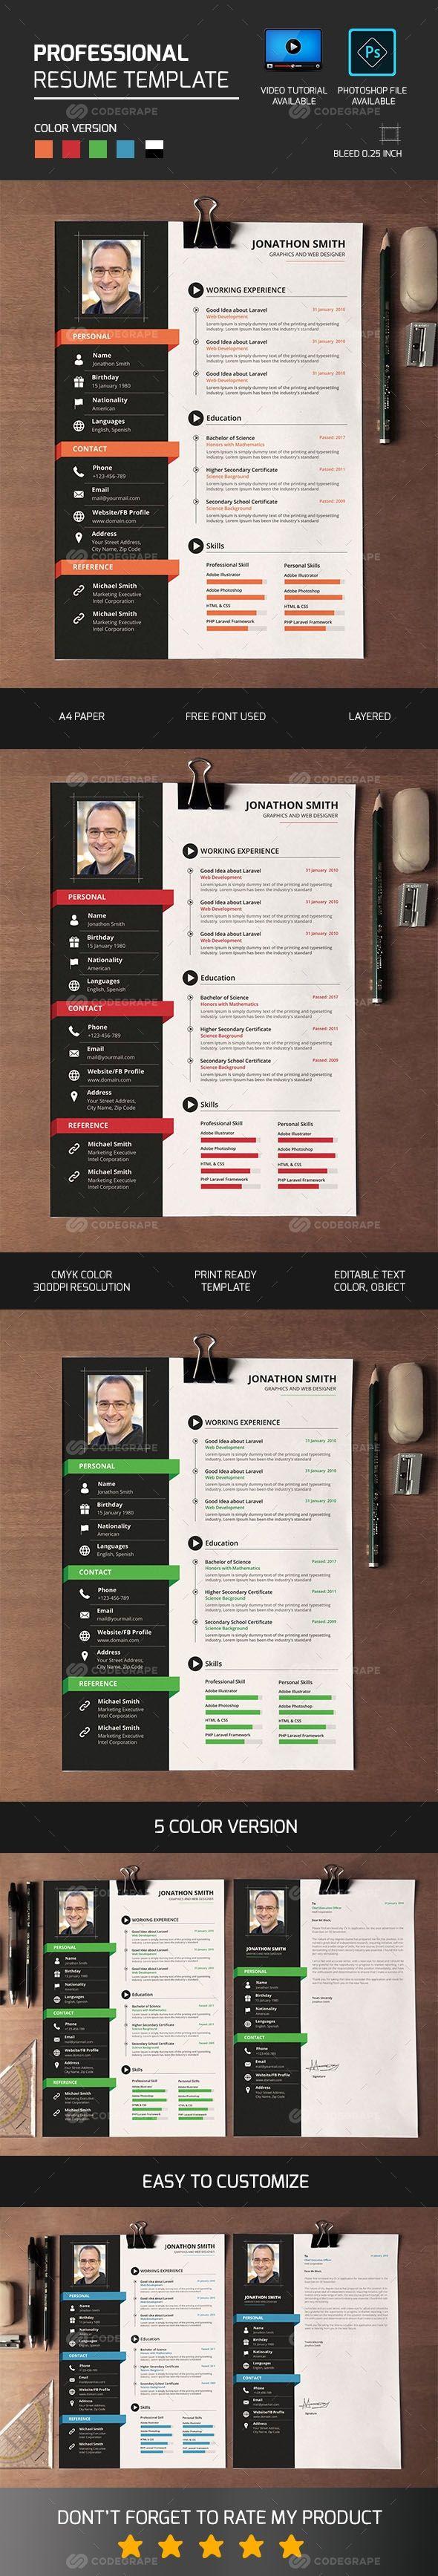 professional resumecv on codegrape more info httpswww